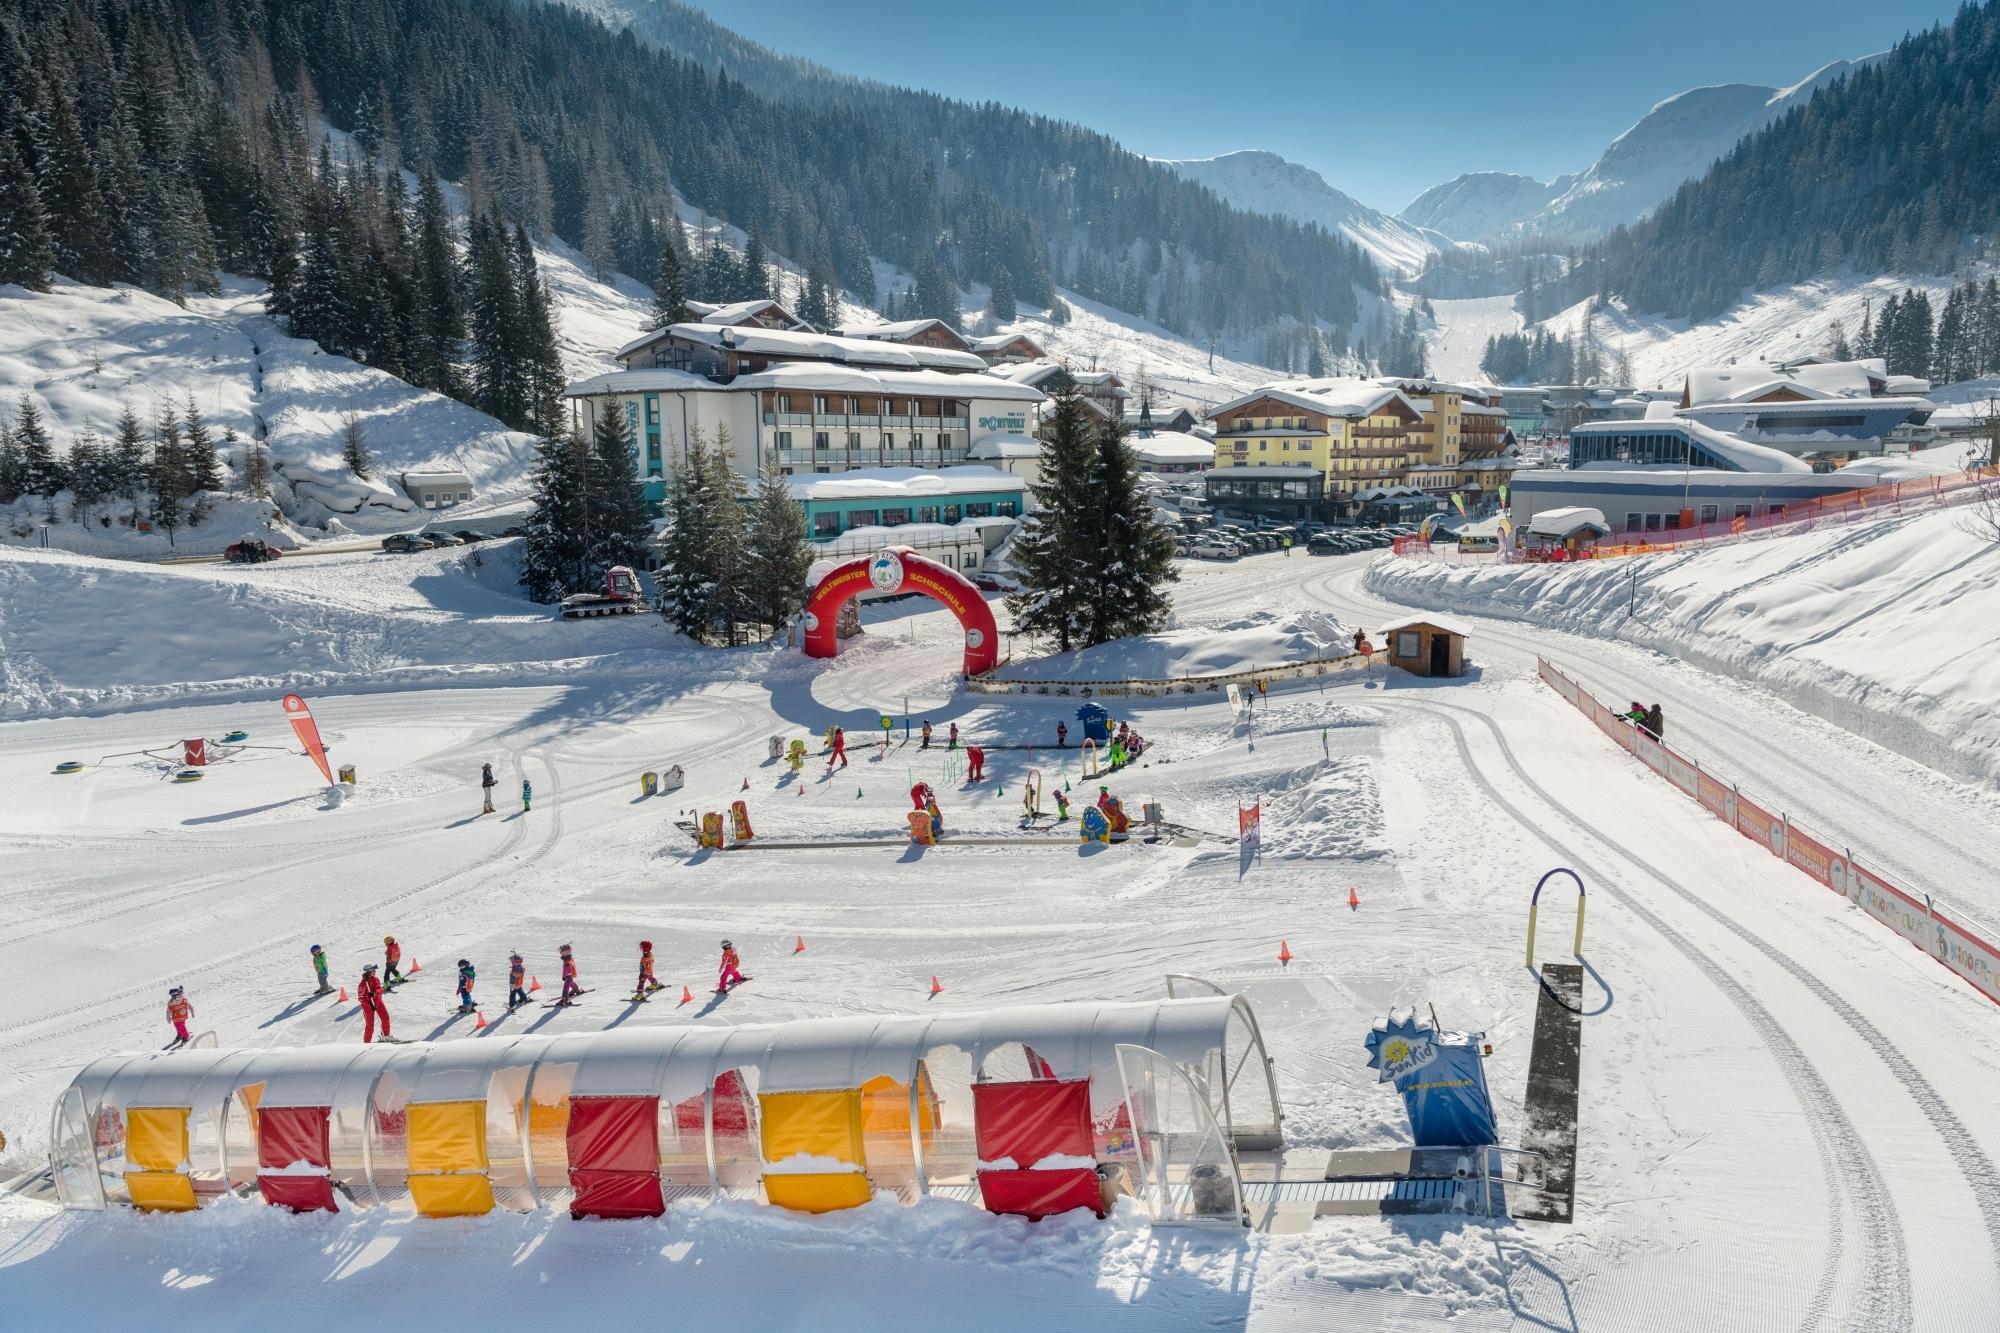 Skigebiet Zauchensee mit Kinder-Ski-Paradies im Tal